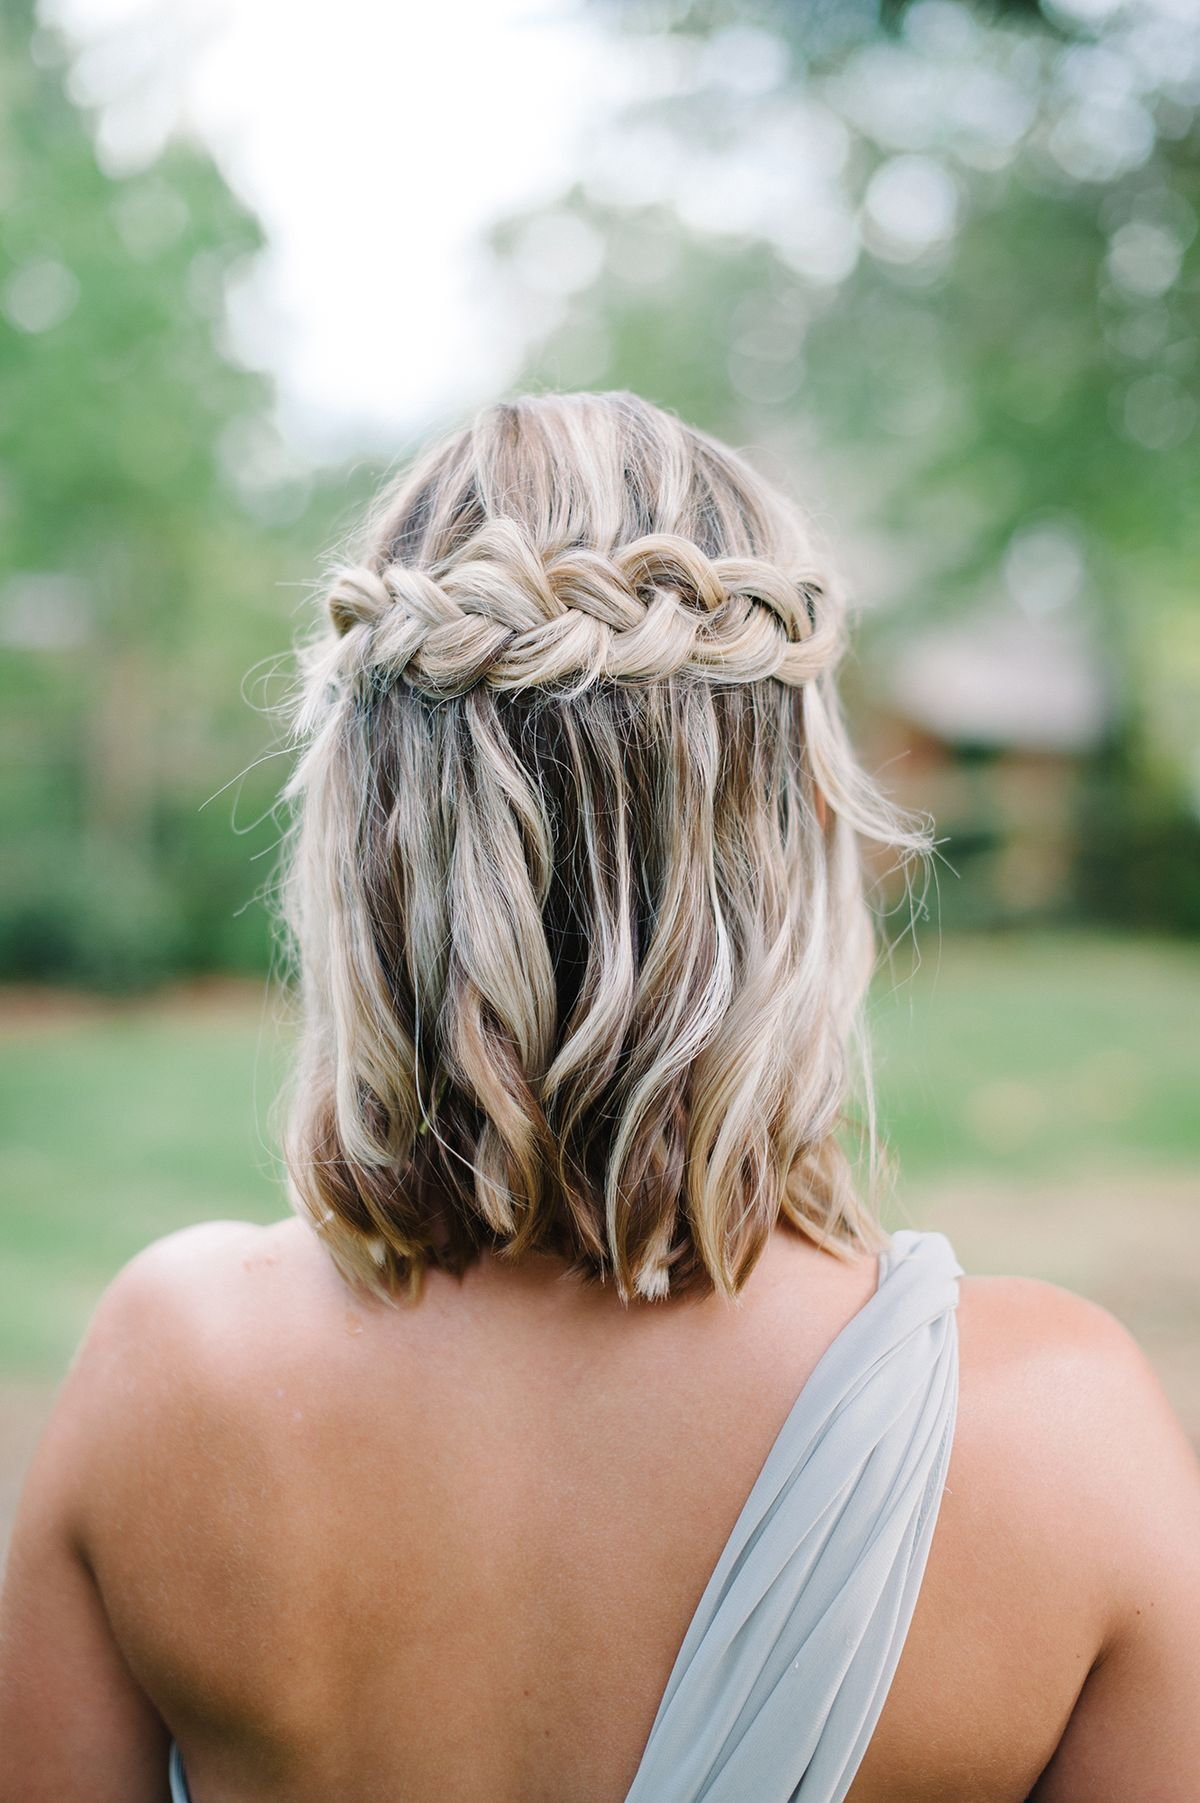 Updos For Medium Length Hair Cute Hairstyles For Short Hair Hair Lengths Long Hair Styles